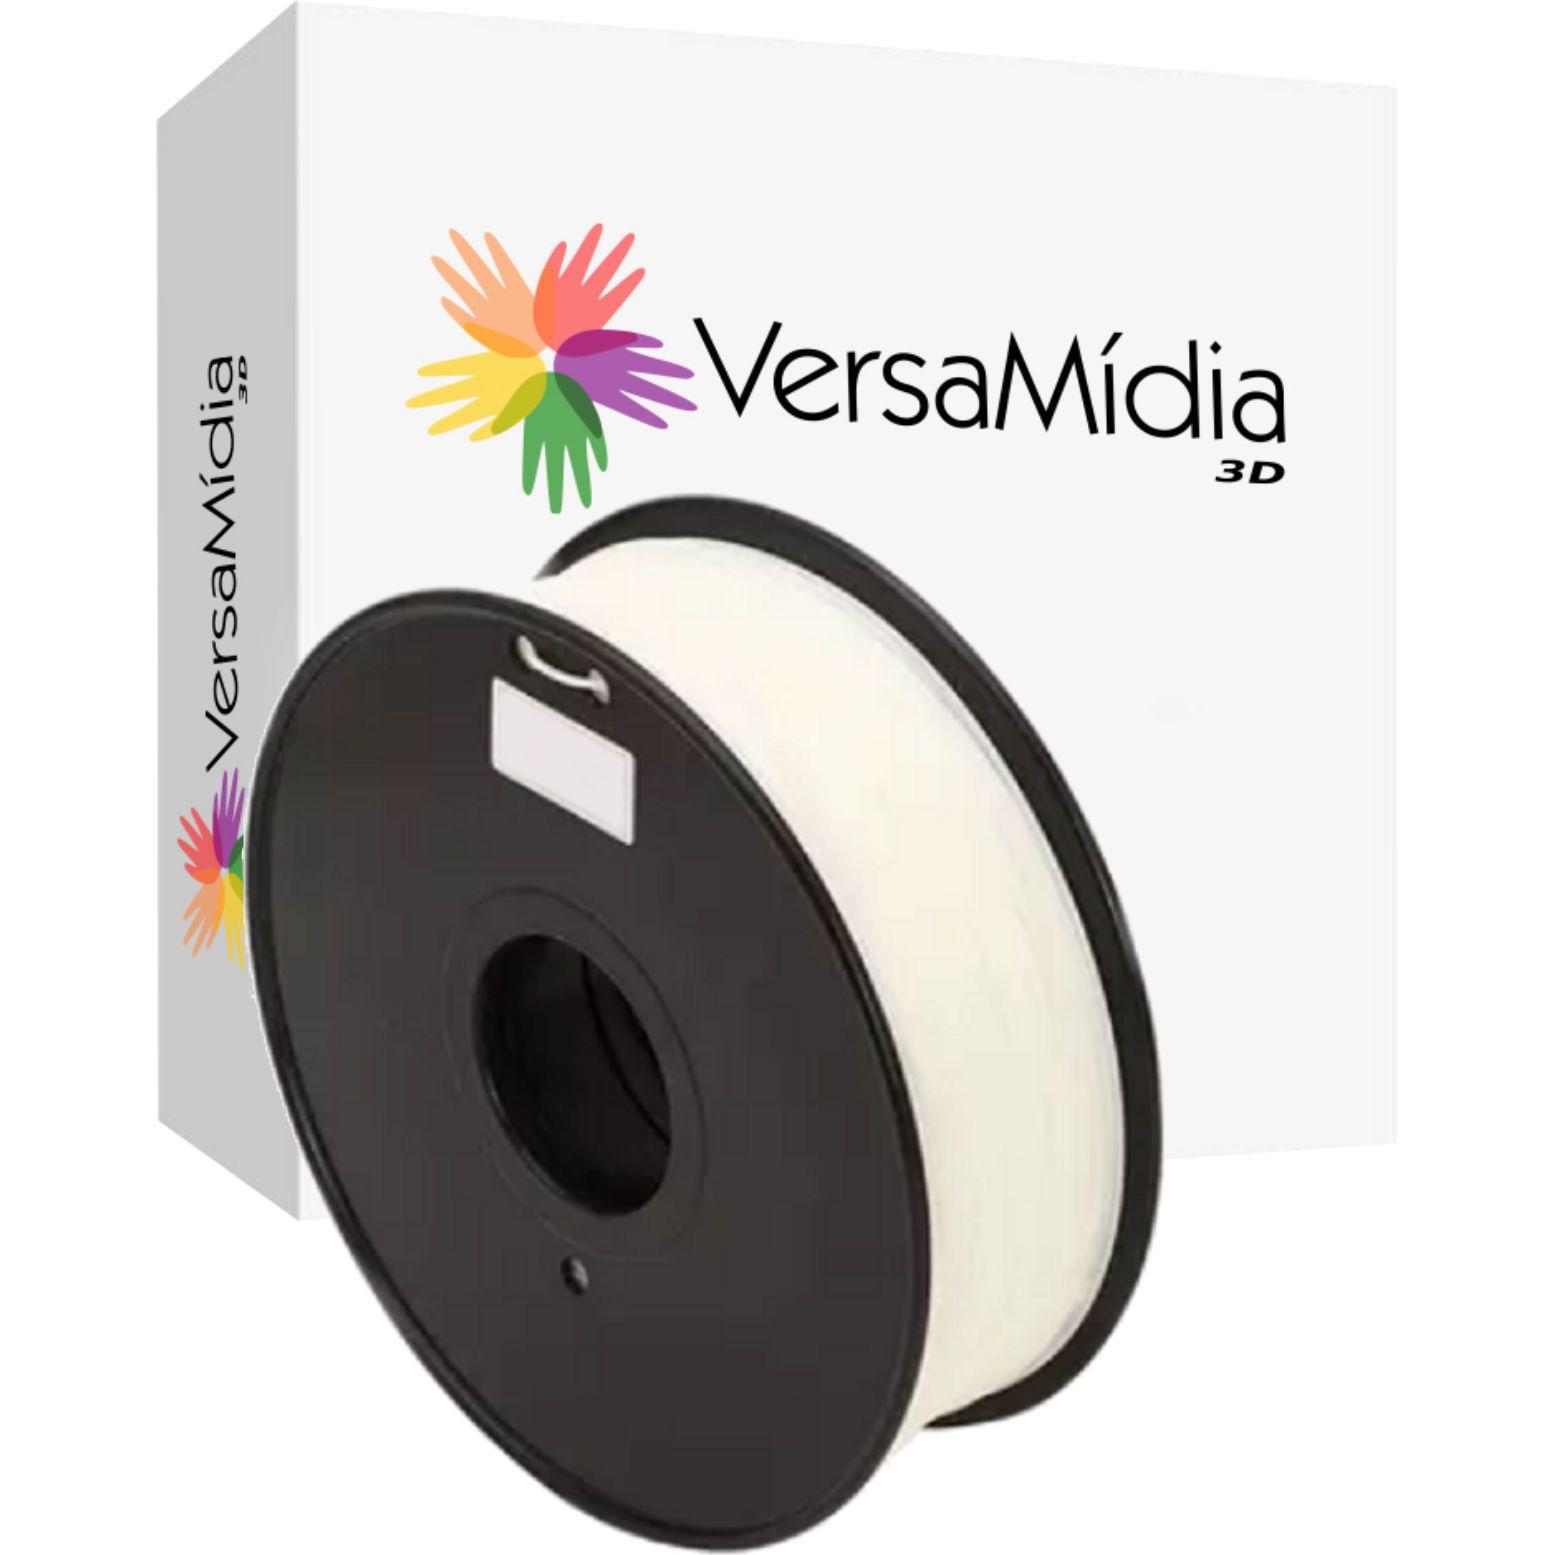 Filamento Flexível TPU  Premium 1.75mm 0.8Kg  VersaMídia 3D -  cód. 11526, 11531